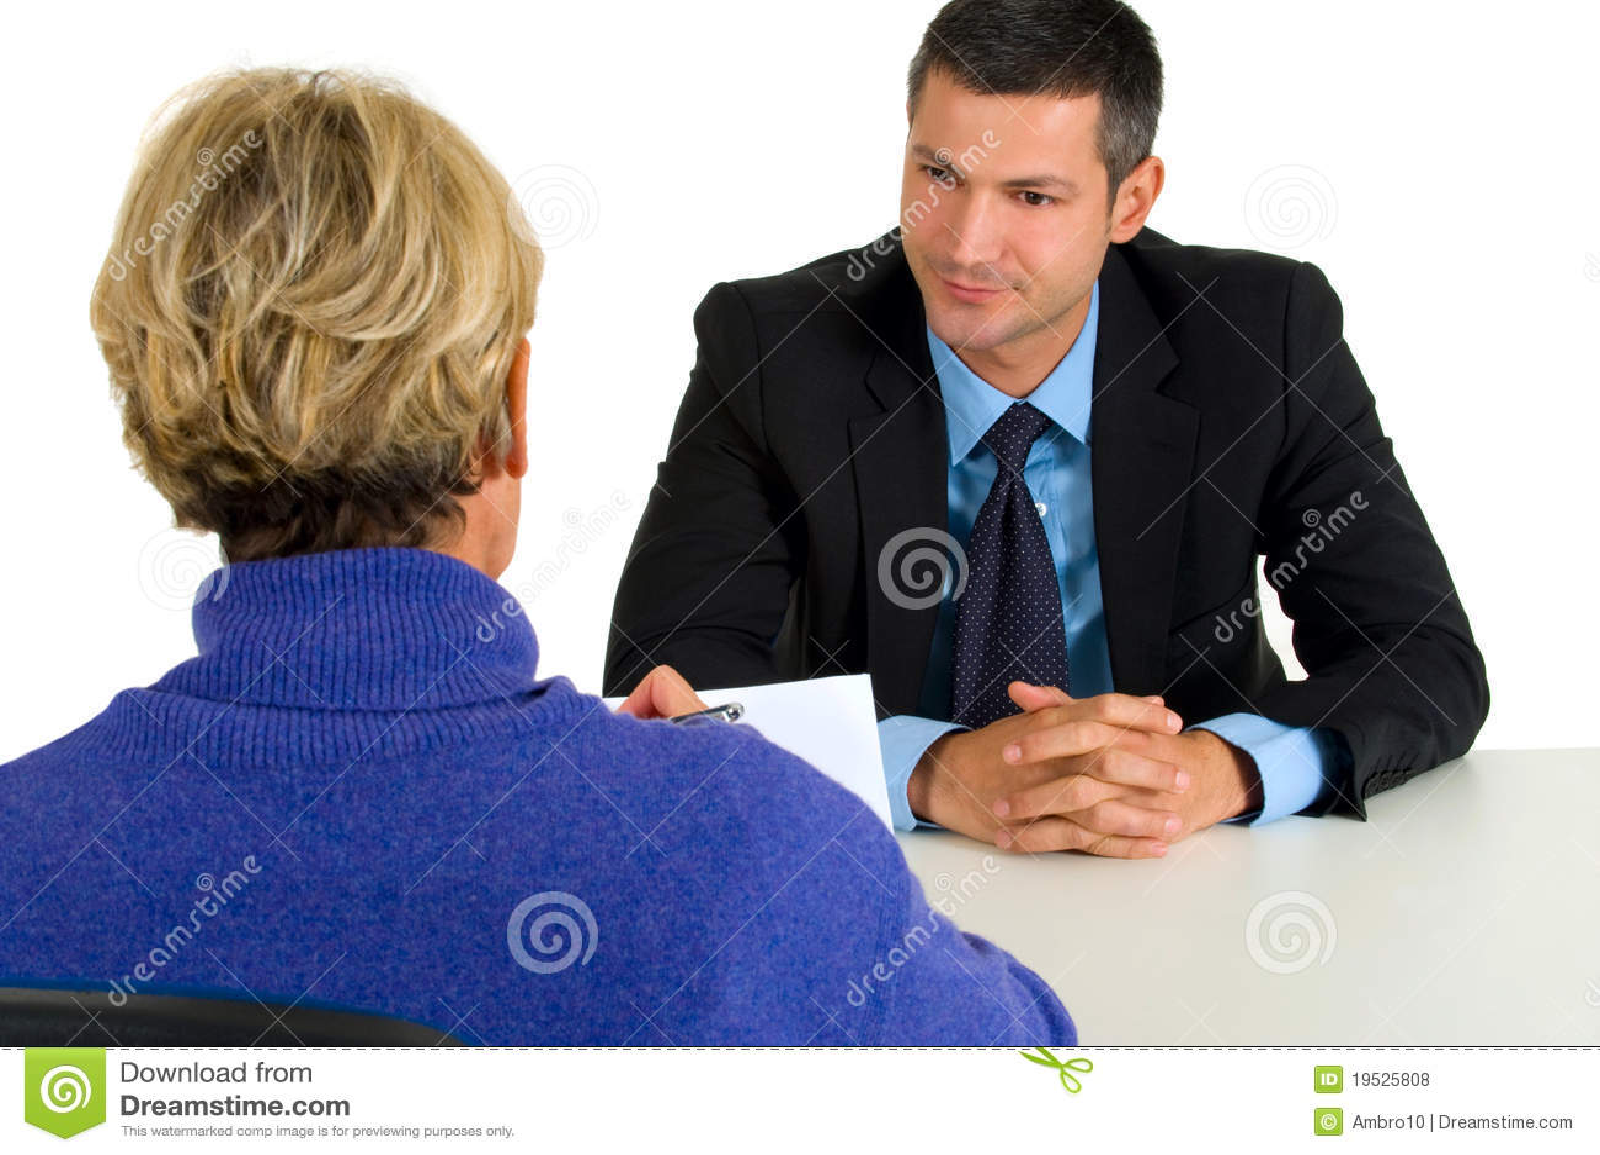 Business Casual Attire Woman